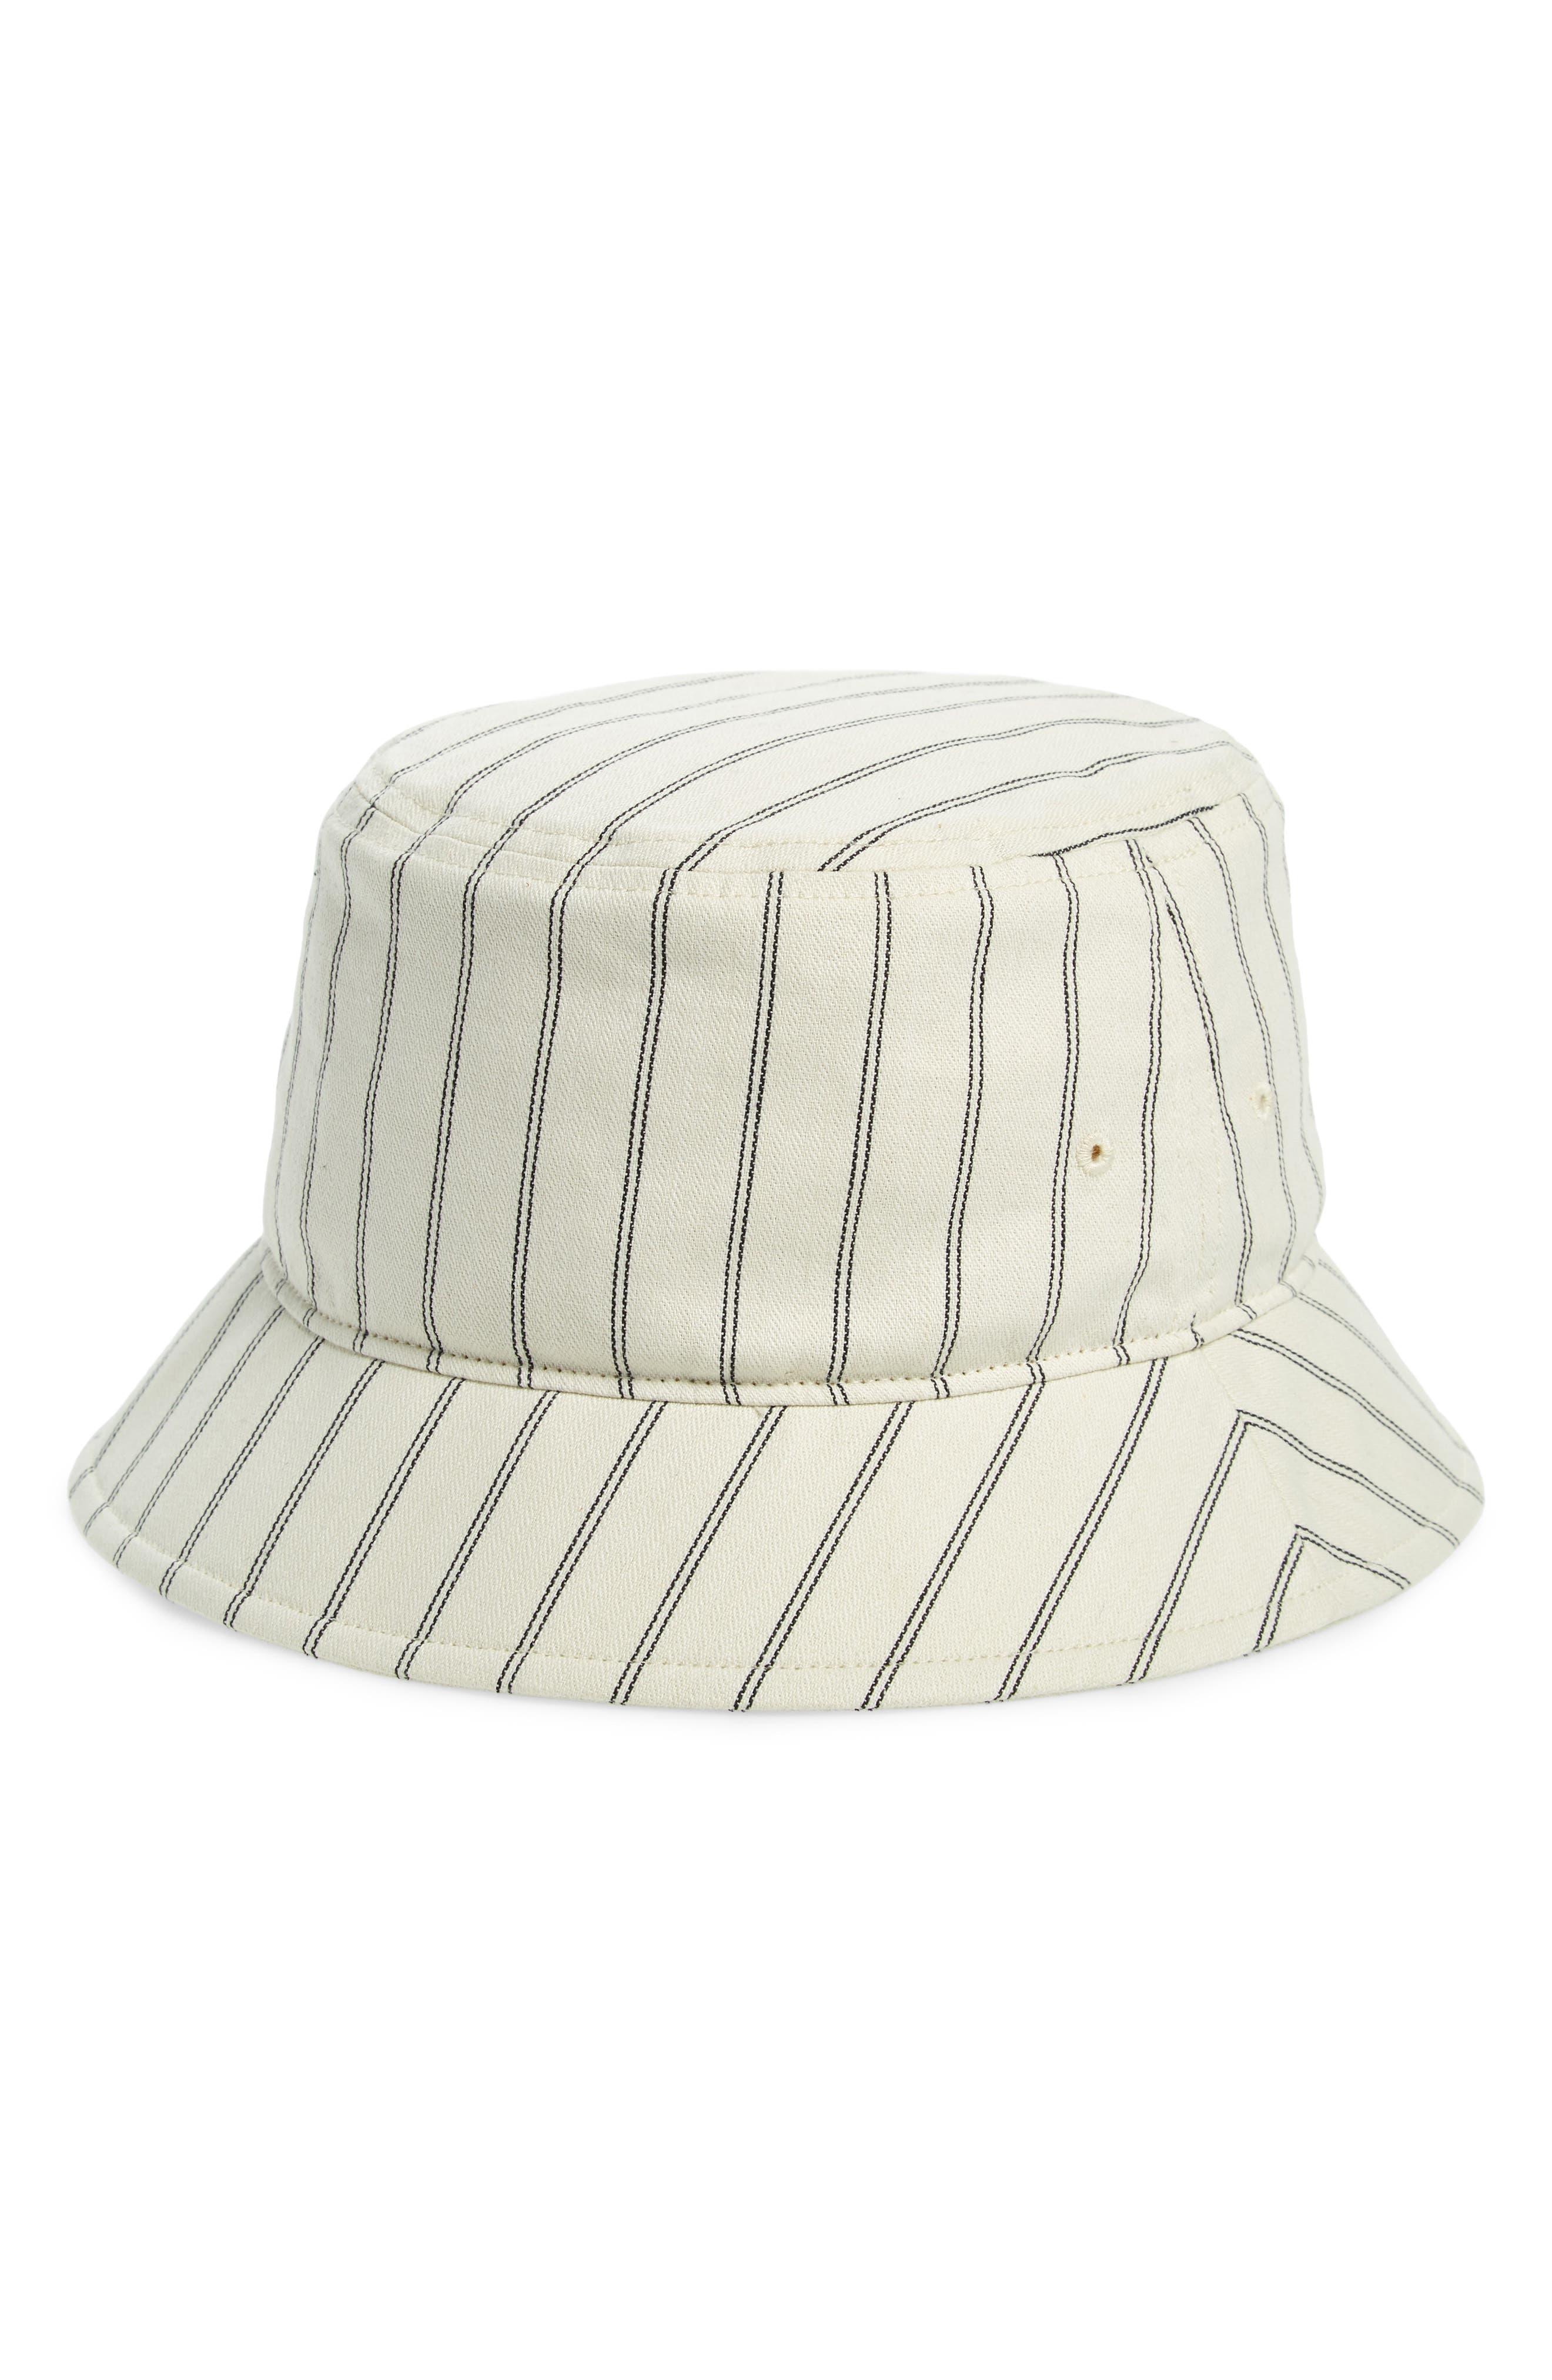 RAG & BONE,                             Ellis Bucket Hat,                             Main thumbnail 1, color,                             IVORY STRIPE